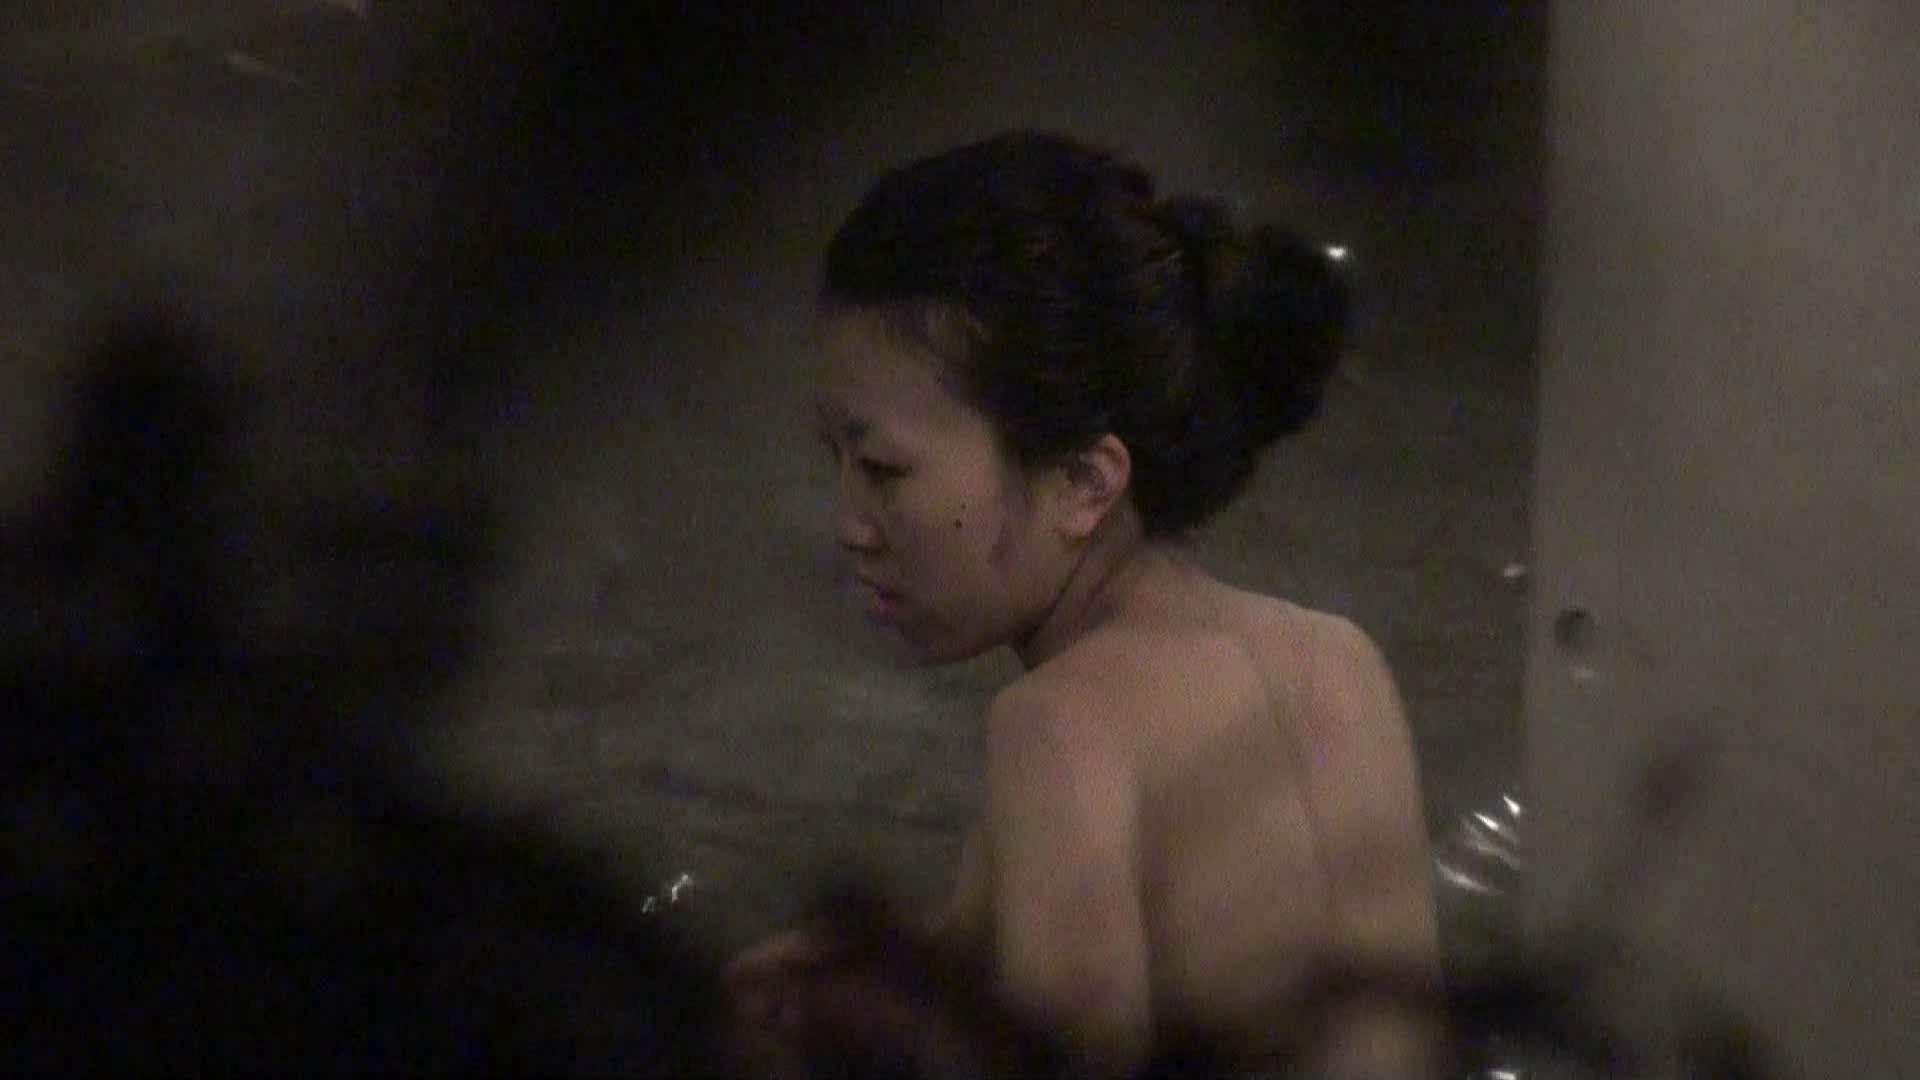 Aquaな露天風呂Vol.375 OLエロ画像 盗撮おめこ無修正動画無料 78PICs 26